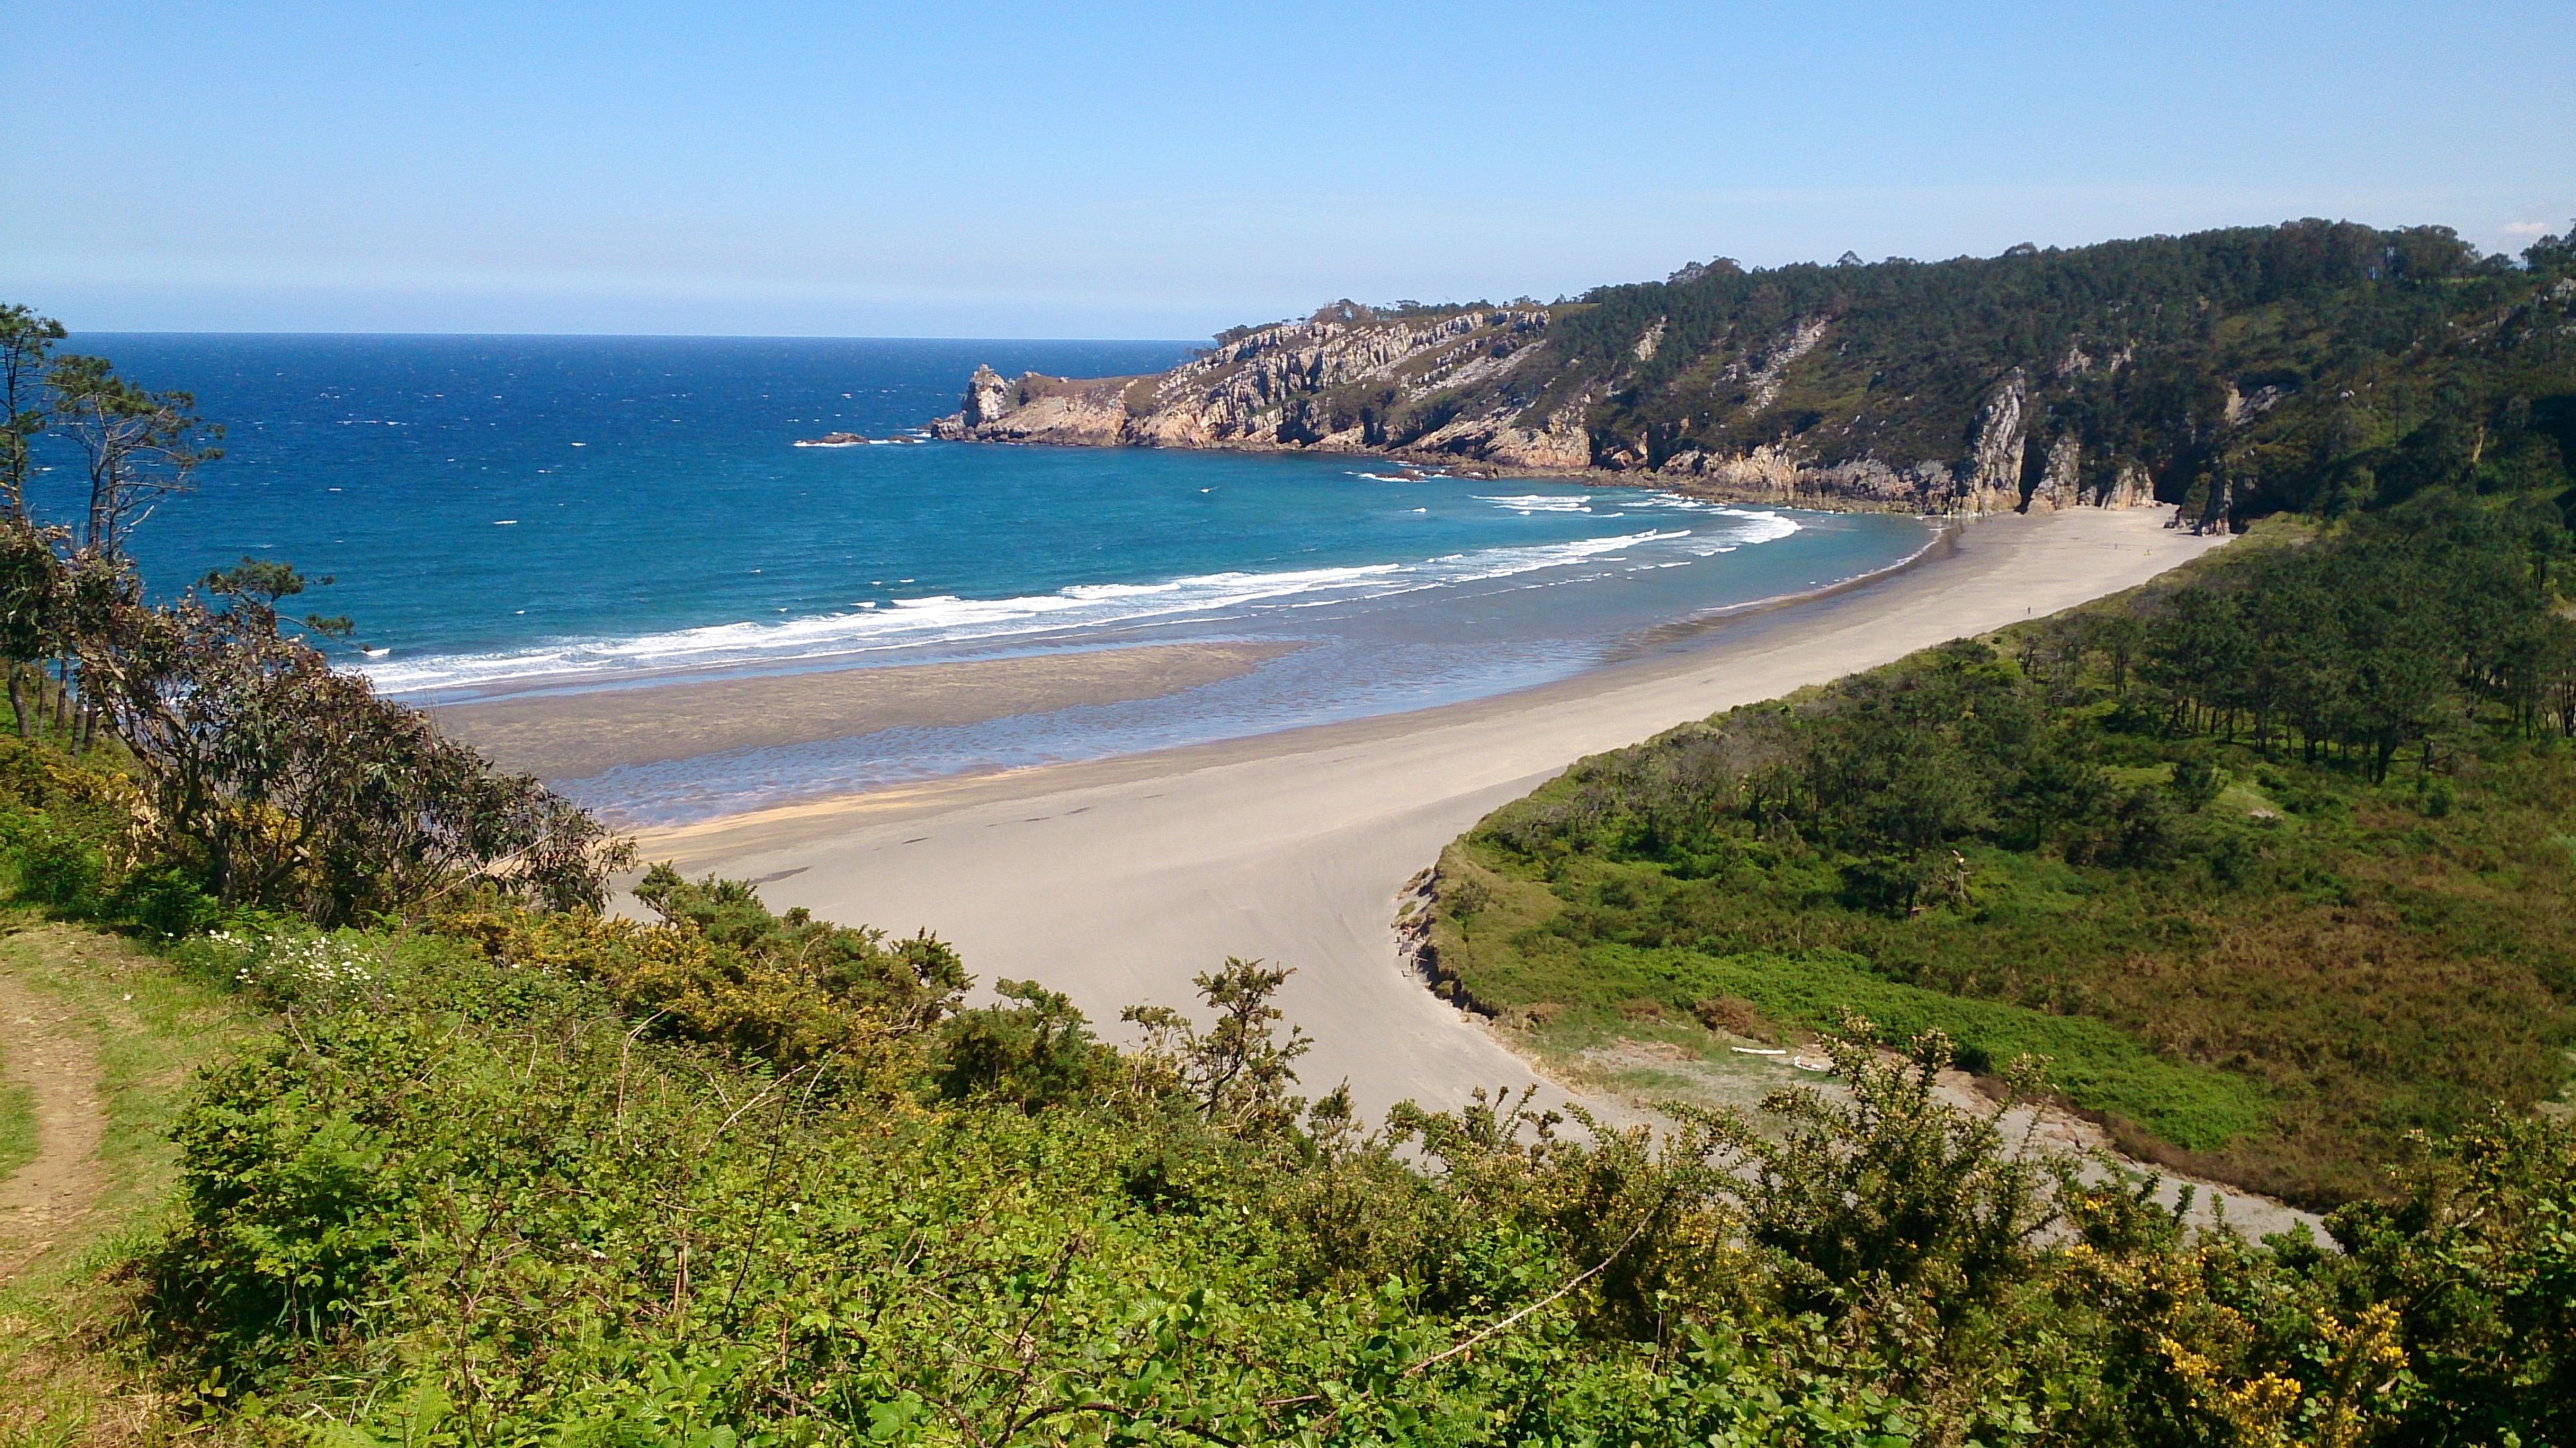 Blick auf den Playa de Barayo